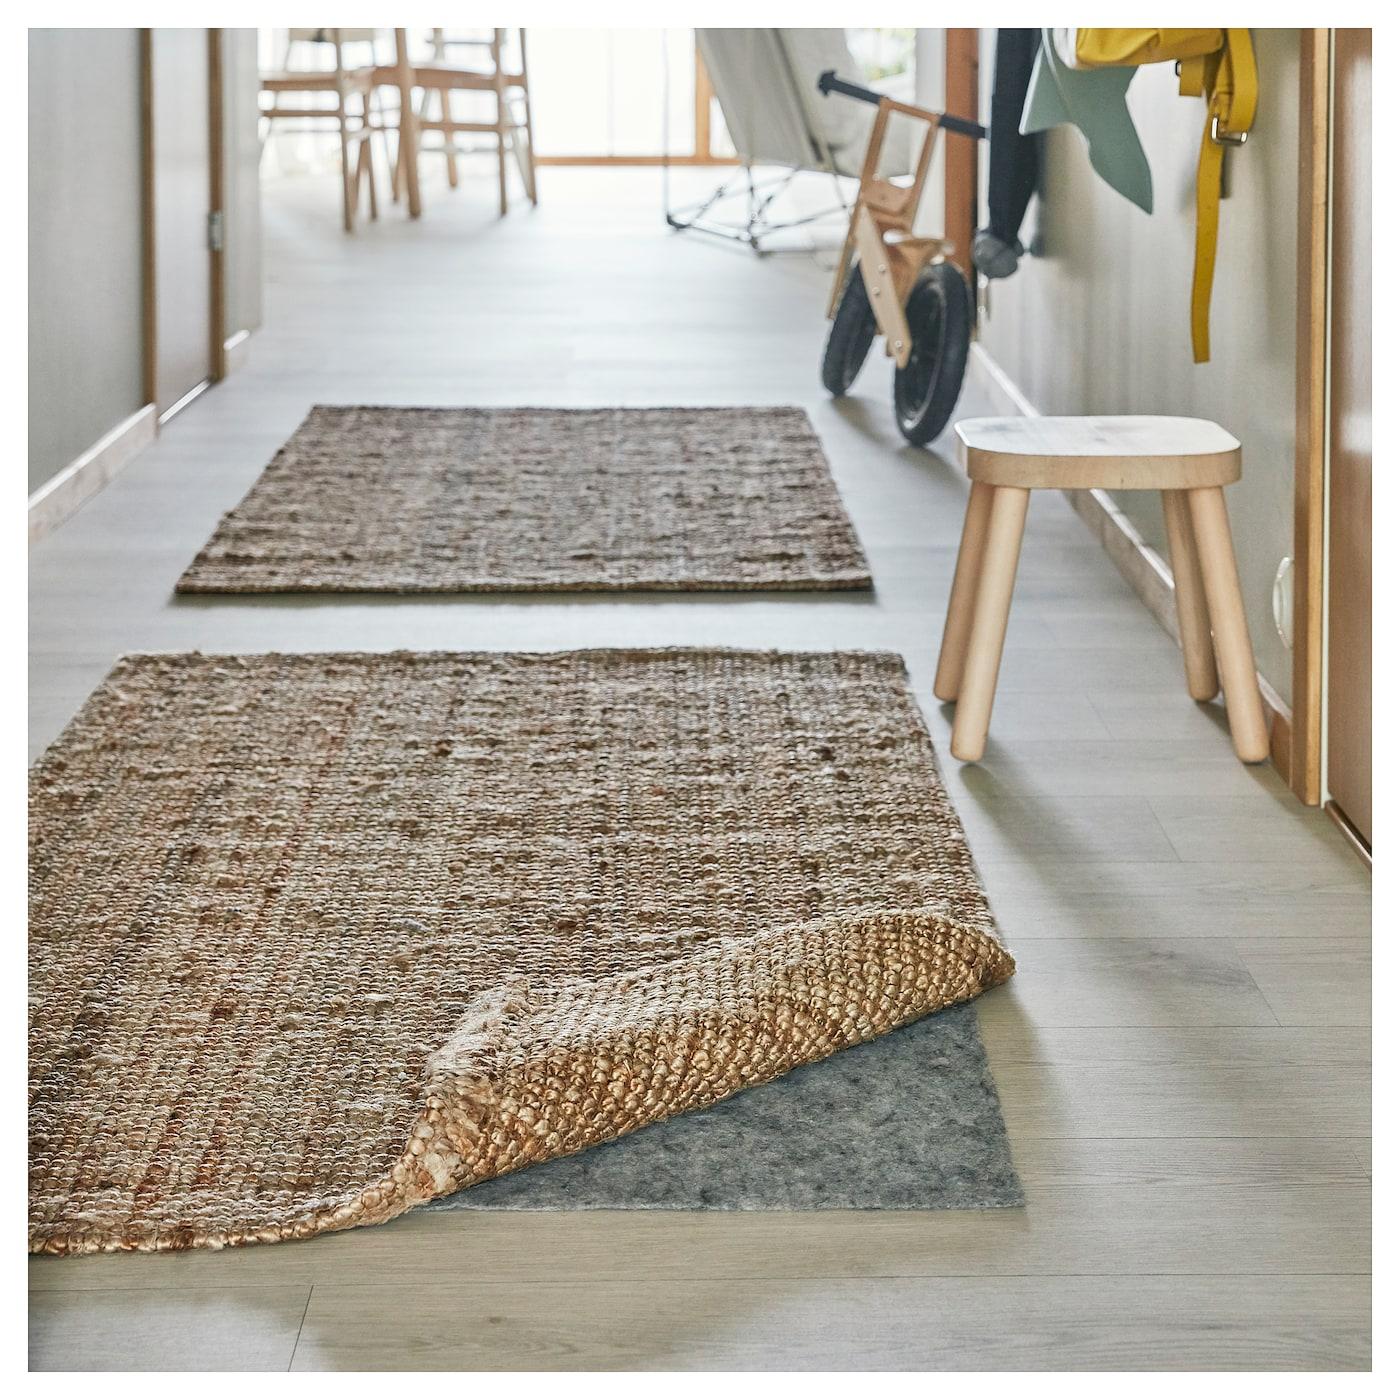 LOHALS Rug, Flatwoven, Natural - IKEA